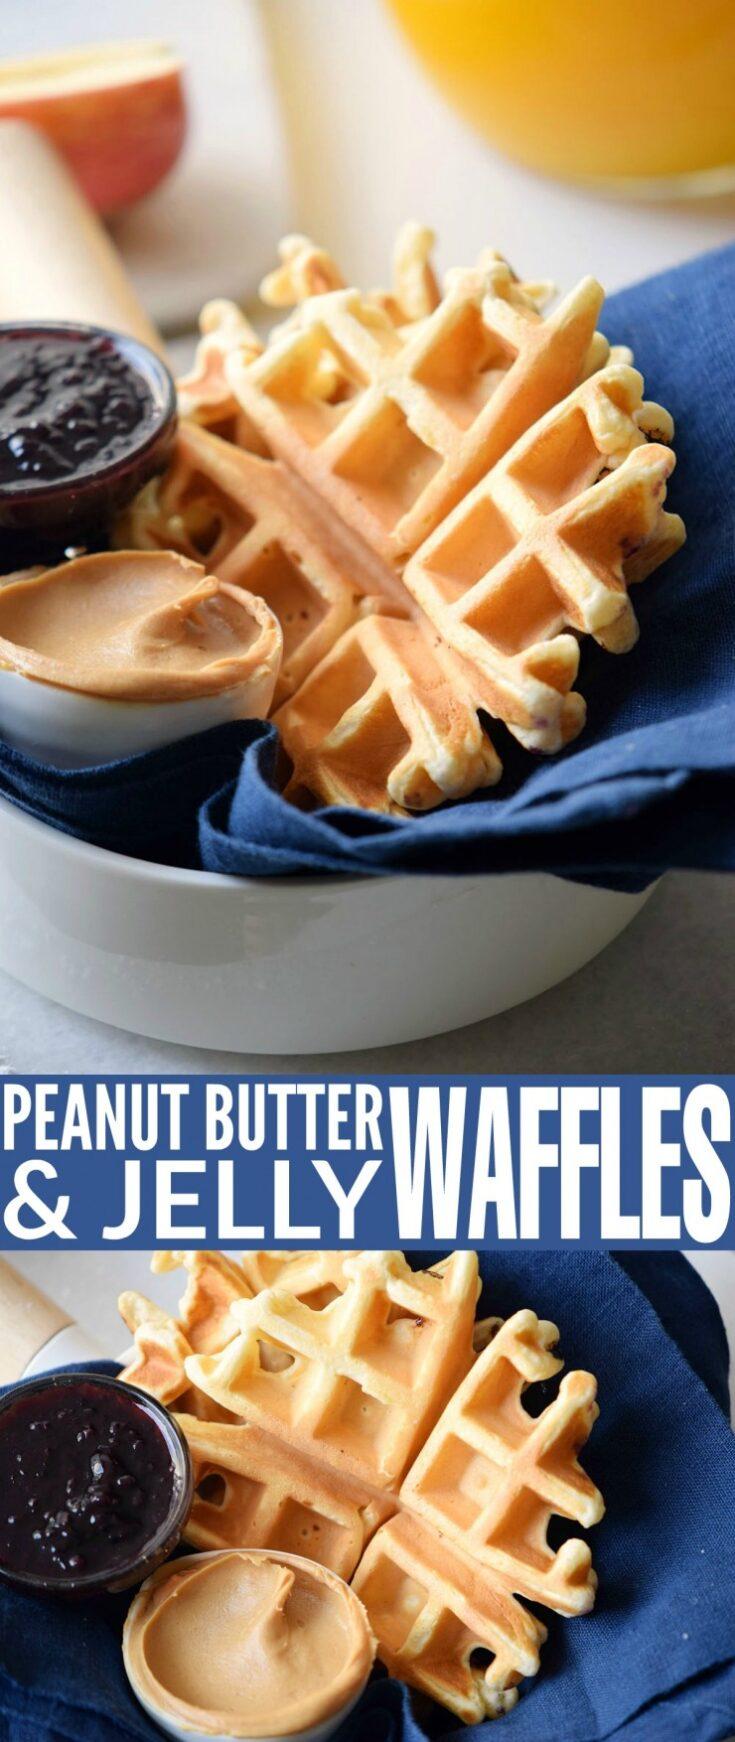 Peanut Butter Jelly Waffles